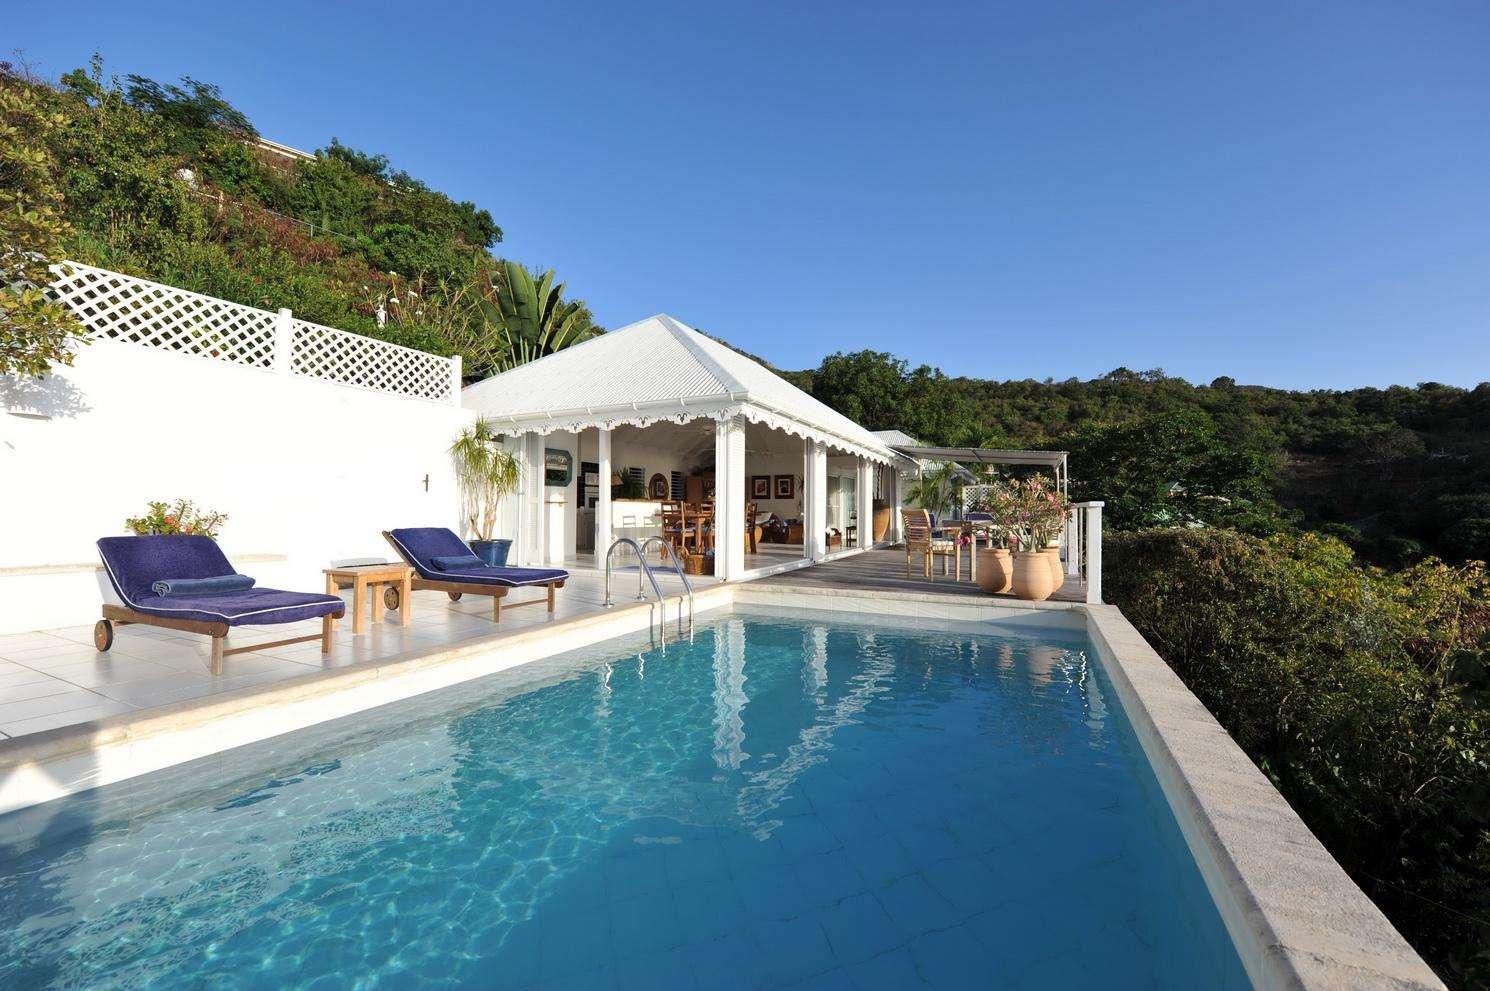 Luxury villa rentals caribbean - St barthelemy - Lorient - Lorient Sunset - Image 1/14